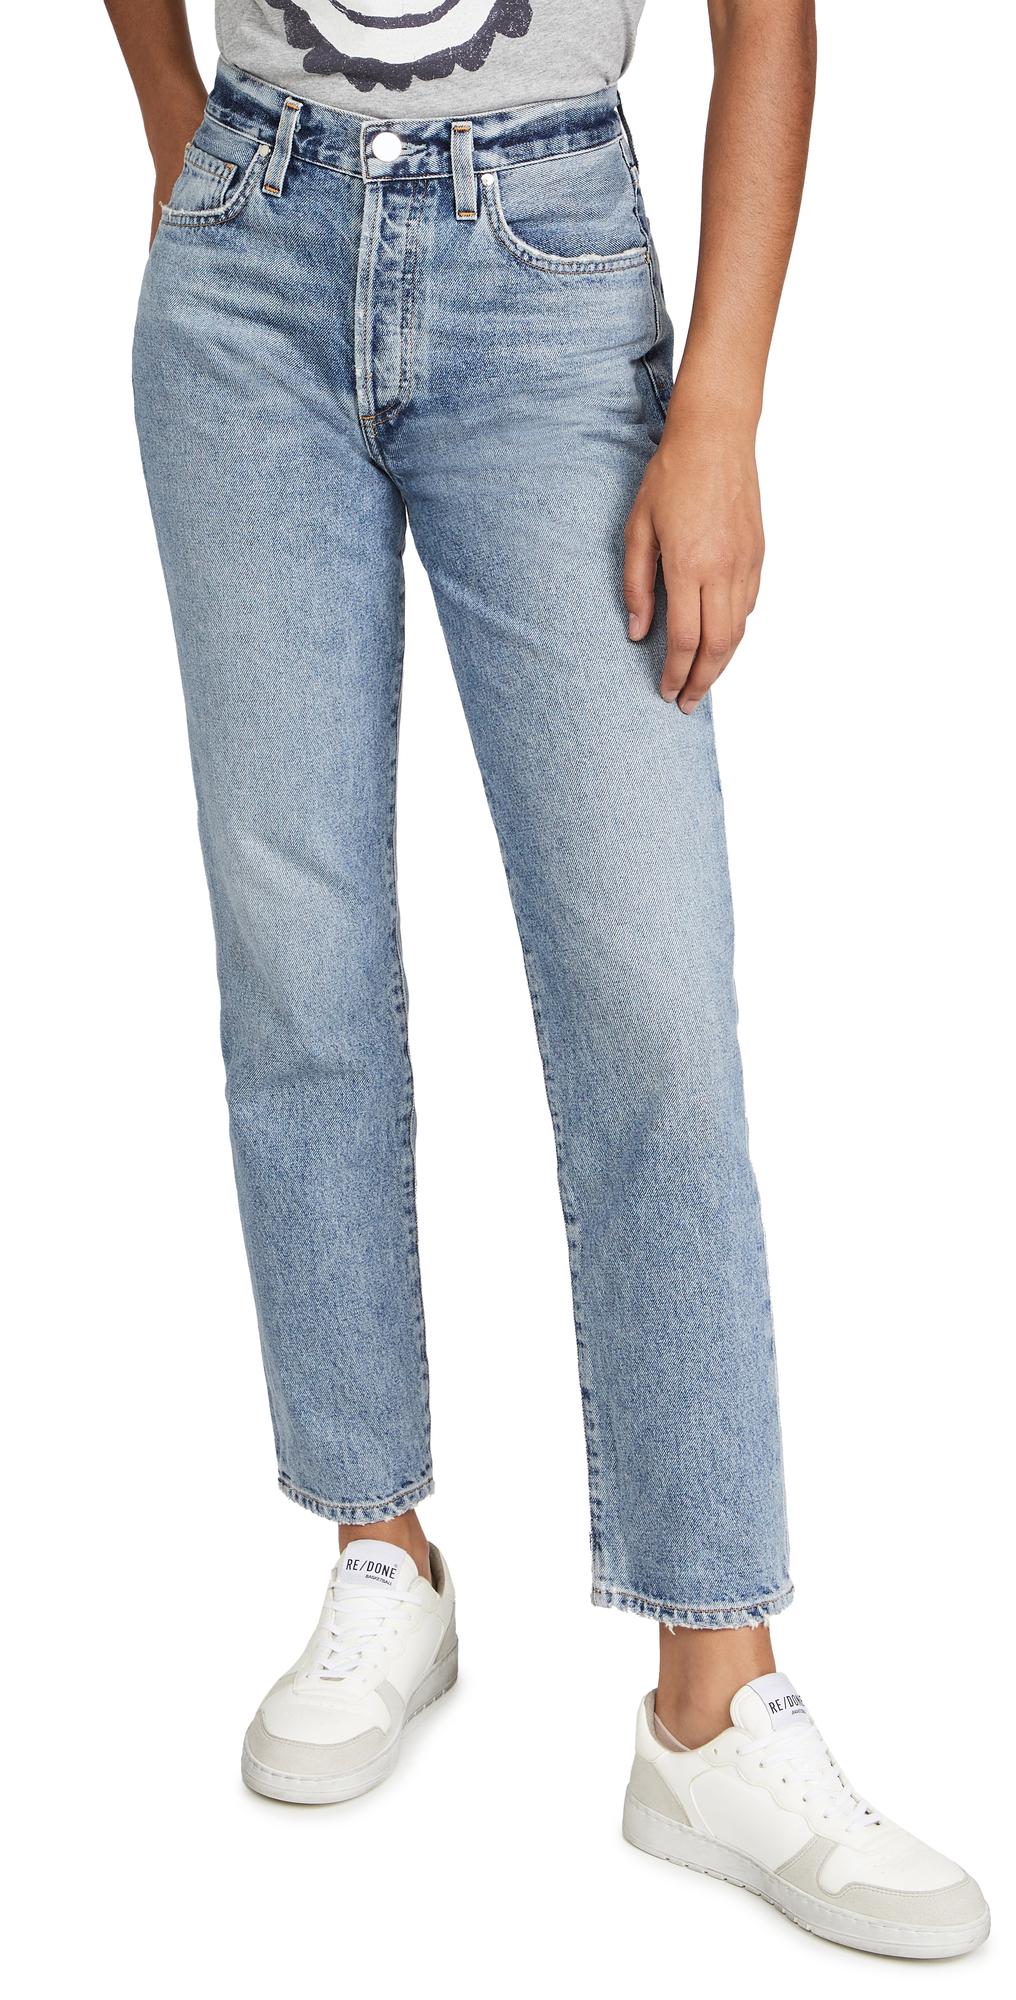 The Harper Jeans